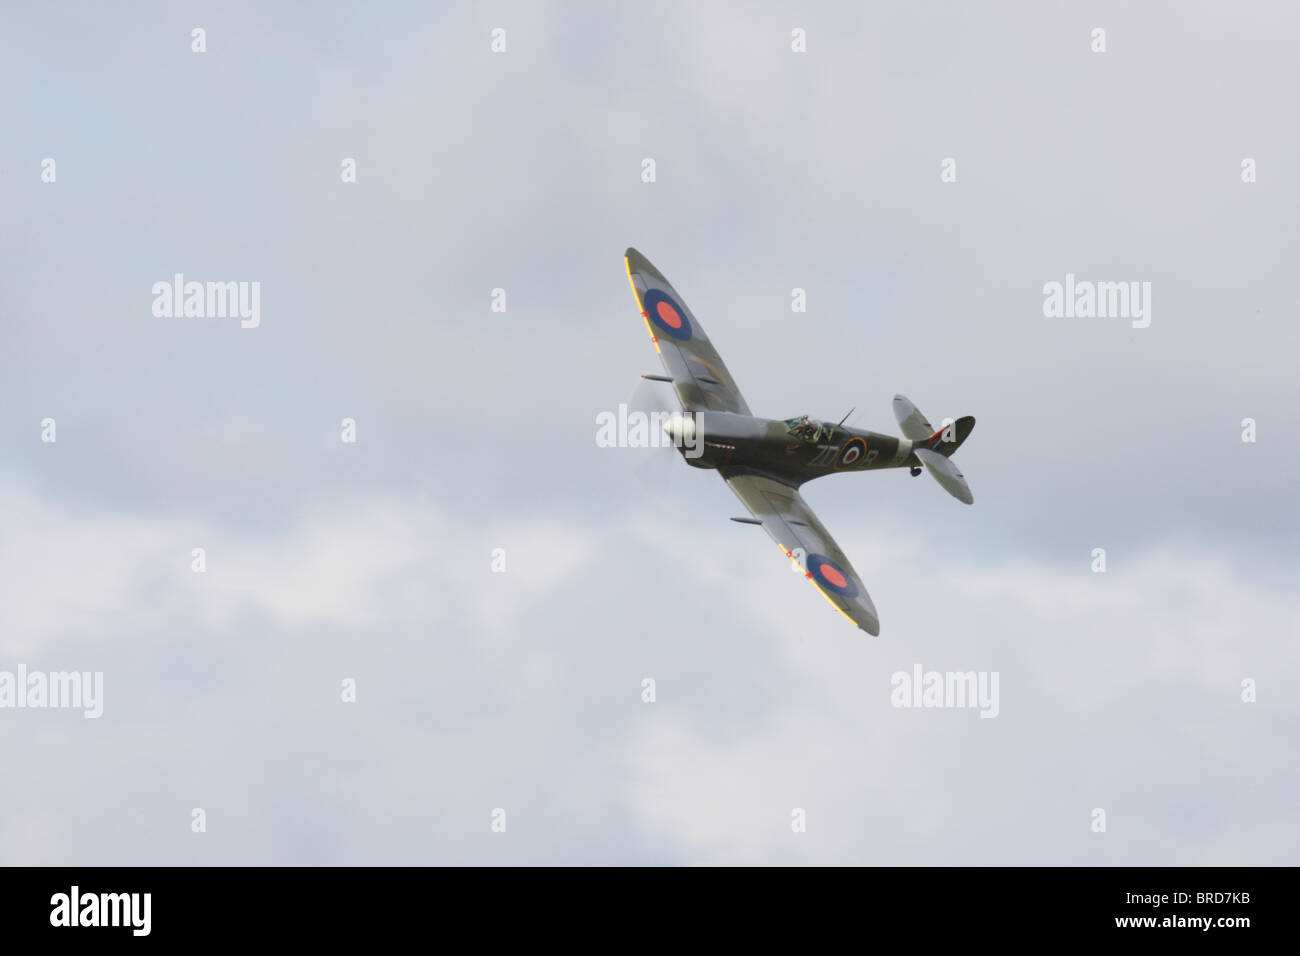 Supermarine Spitfire displaying at Goodwood 2010 - Stock Image